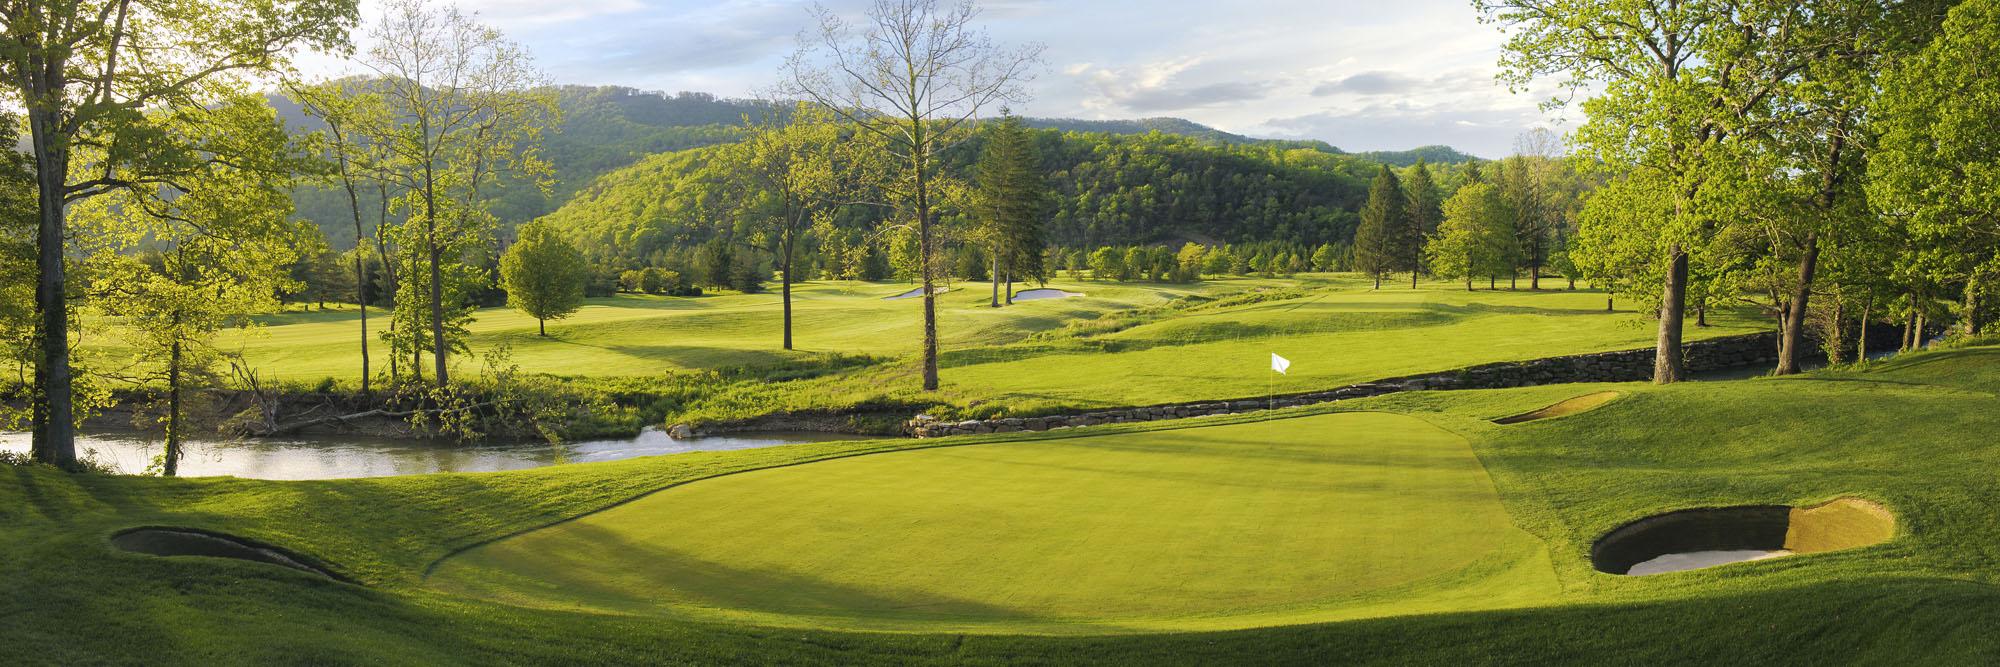 Golf Course Image - The Greenbrier Meadows Course No. 12